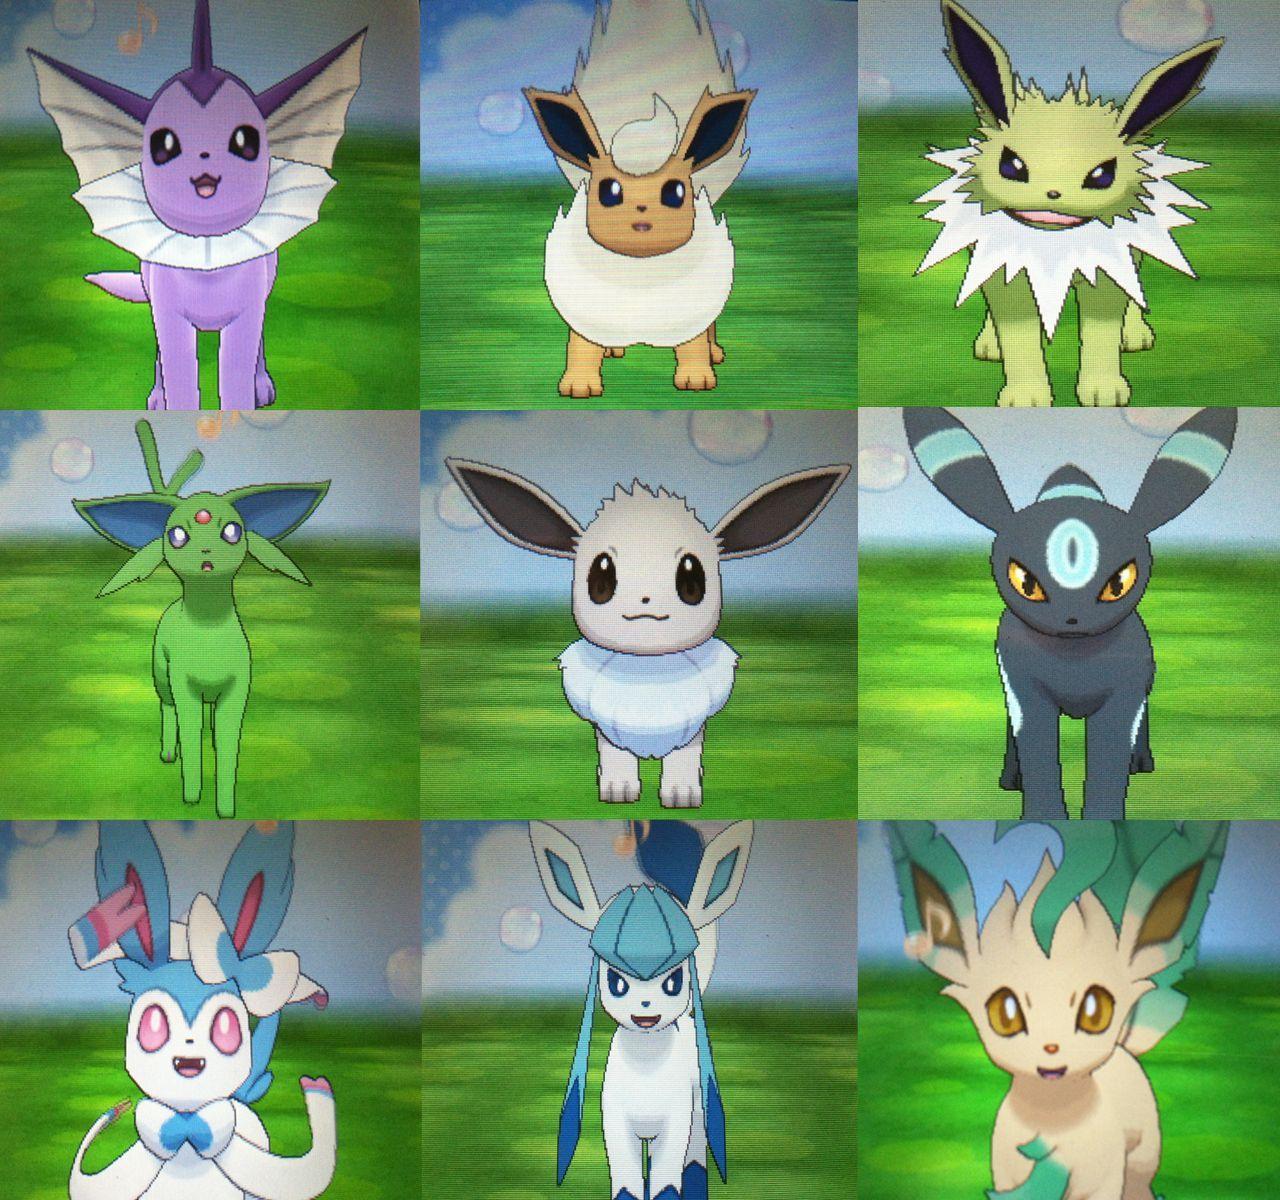 Eevee Shiny Pokemon Qr Codes Images | Pokemon Images